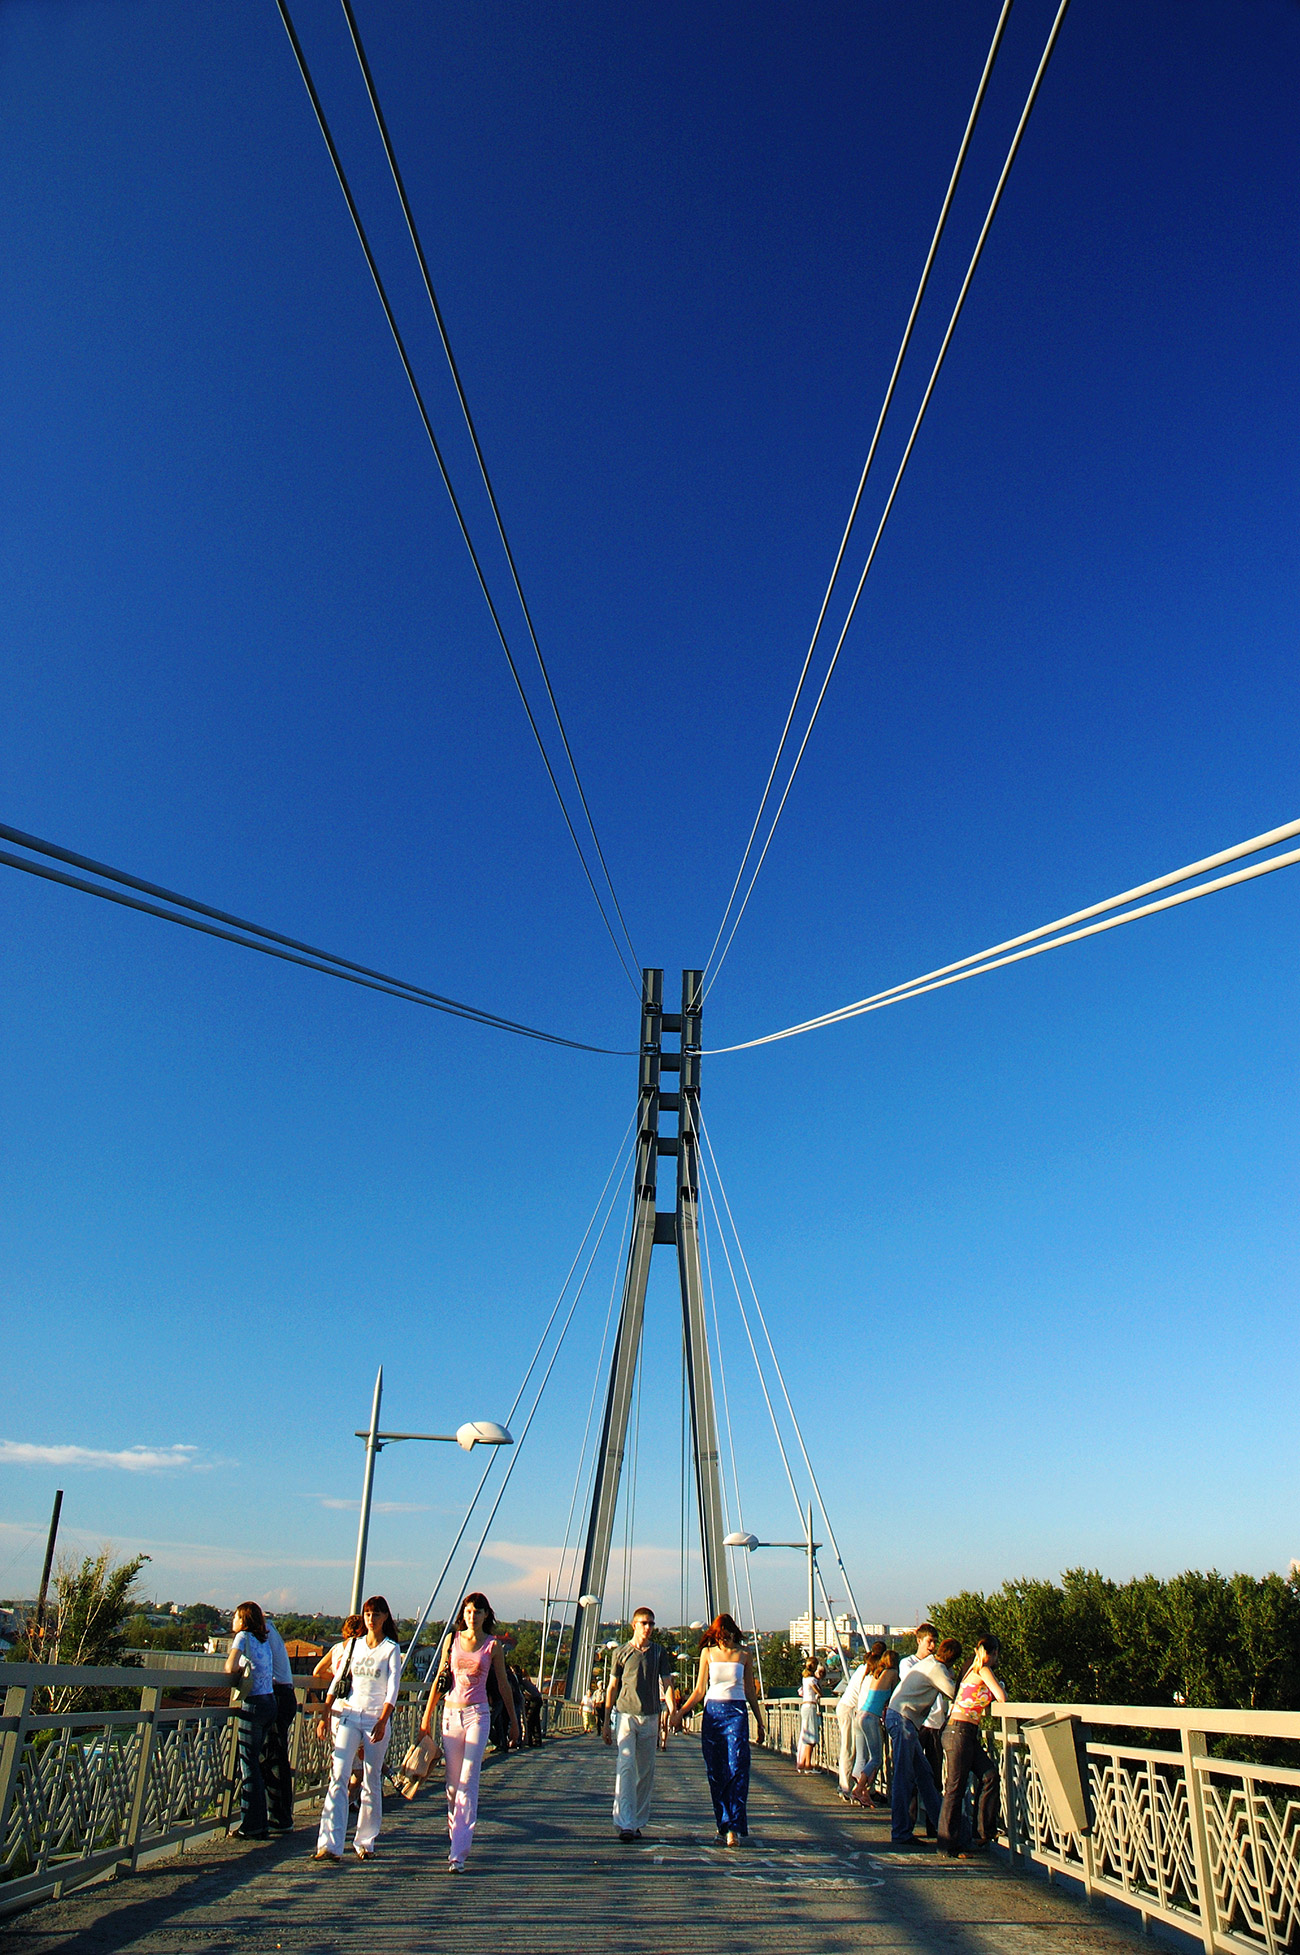 Il ponte sul fiume Tura a Tymen. Fonte: Allexander Makarov/Global Look Press